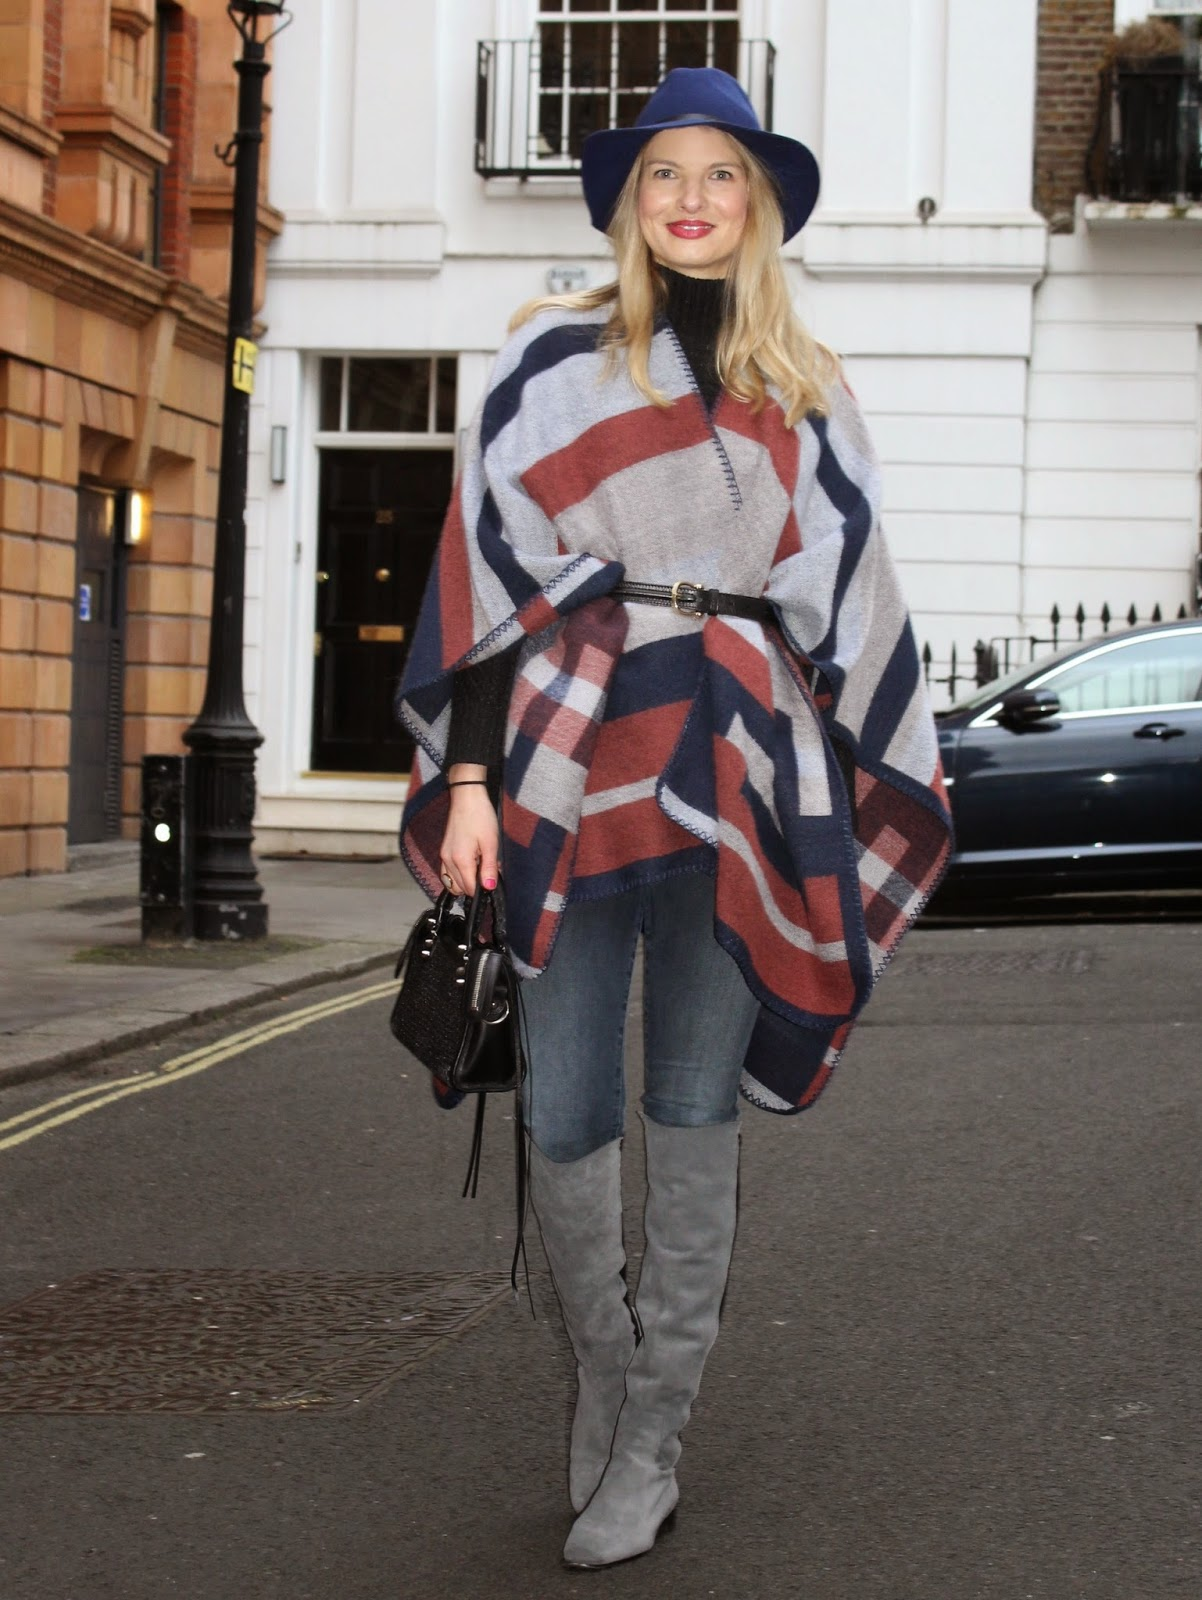 street style london, zara overknee boots, flat overknee boots, grey overknee boots, balenciaga bag, fashion blogger, german fashionblogger, shop noir bracelet, spiky bracelet